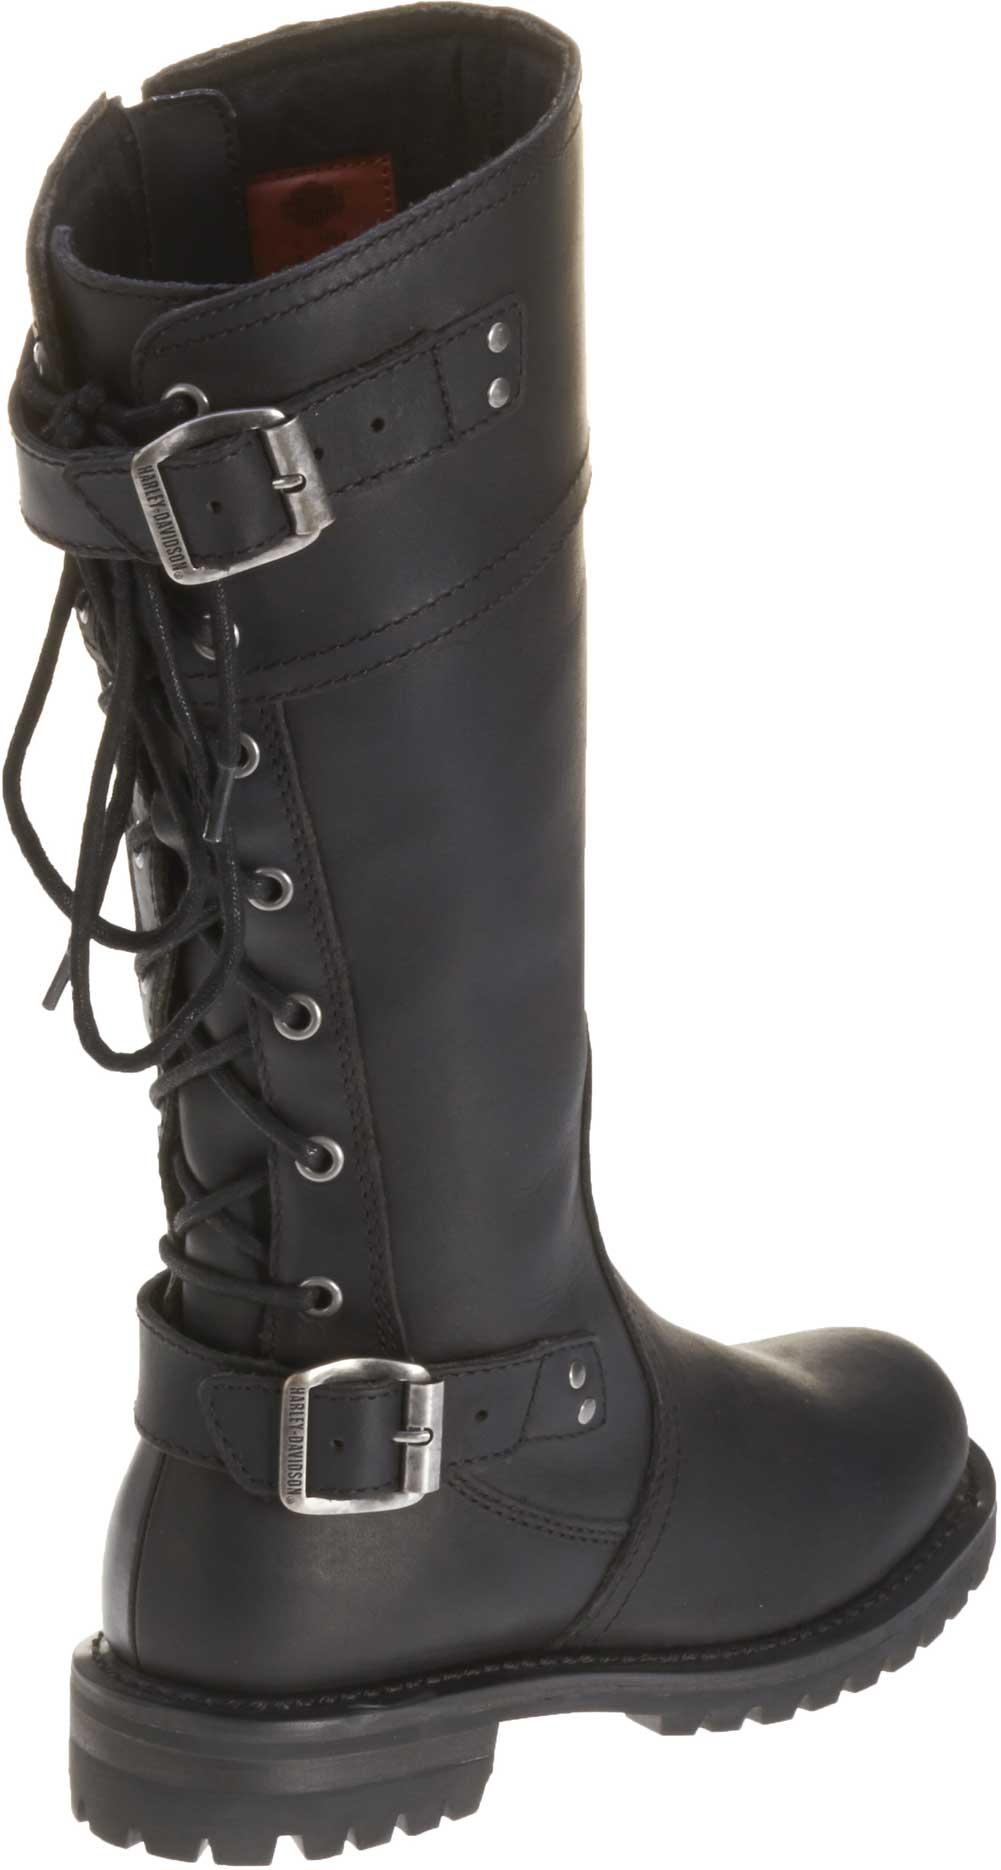 harley davidson s back lace black leather